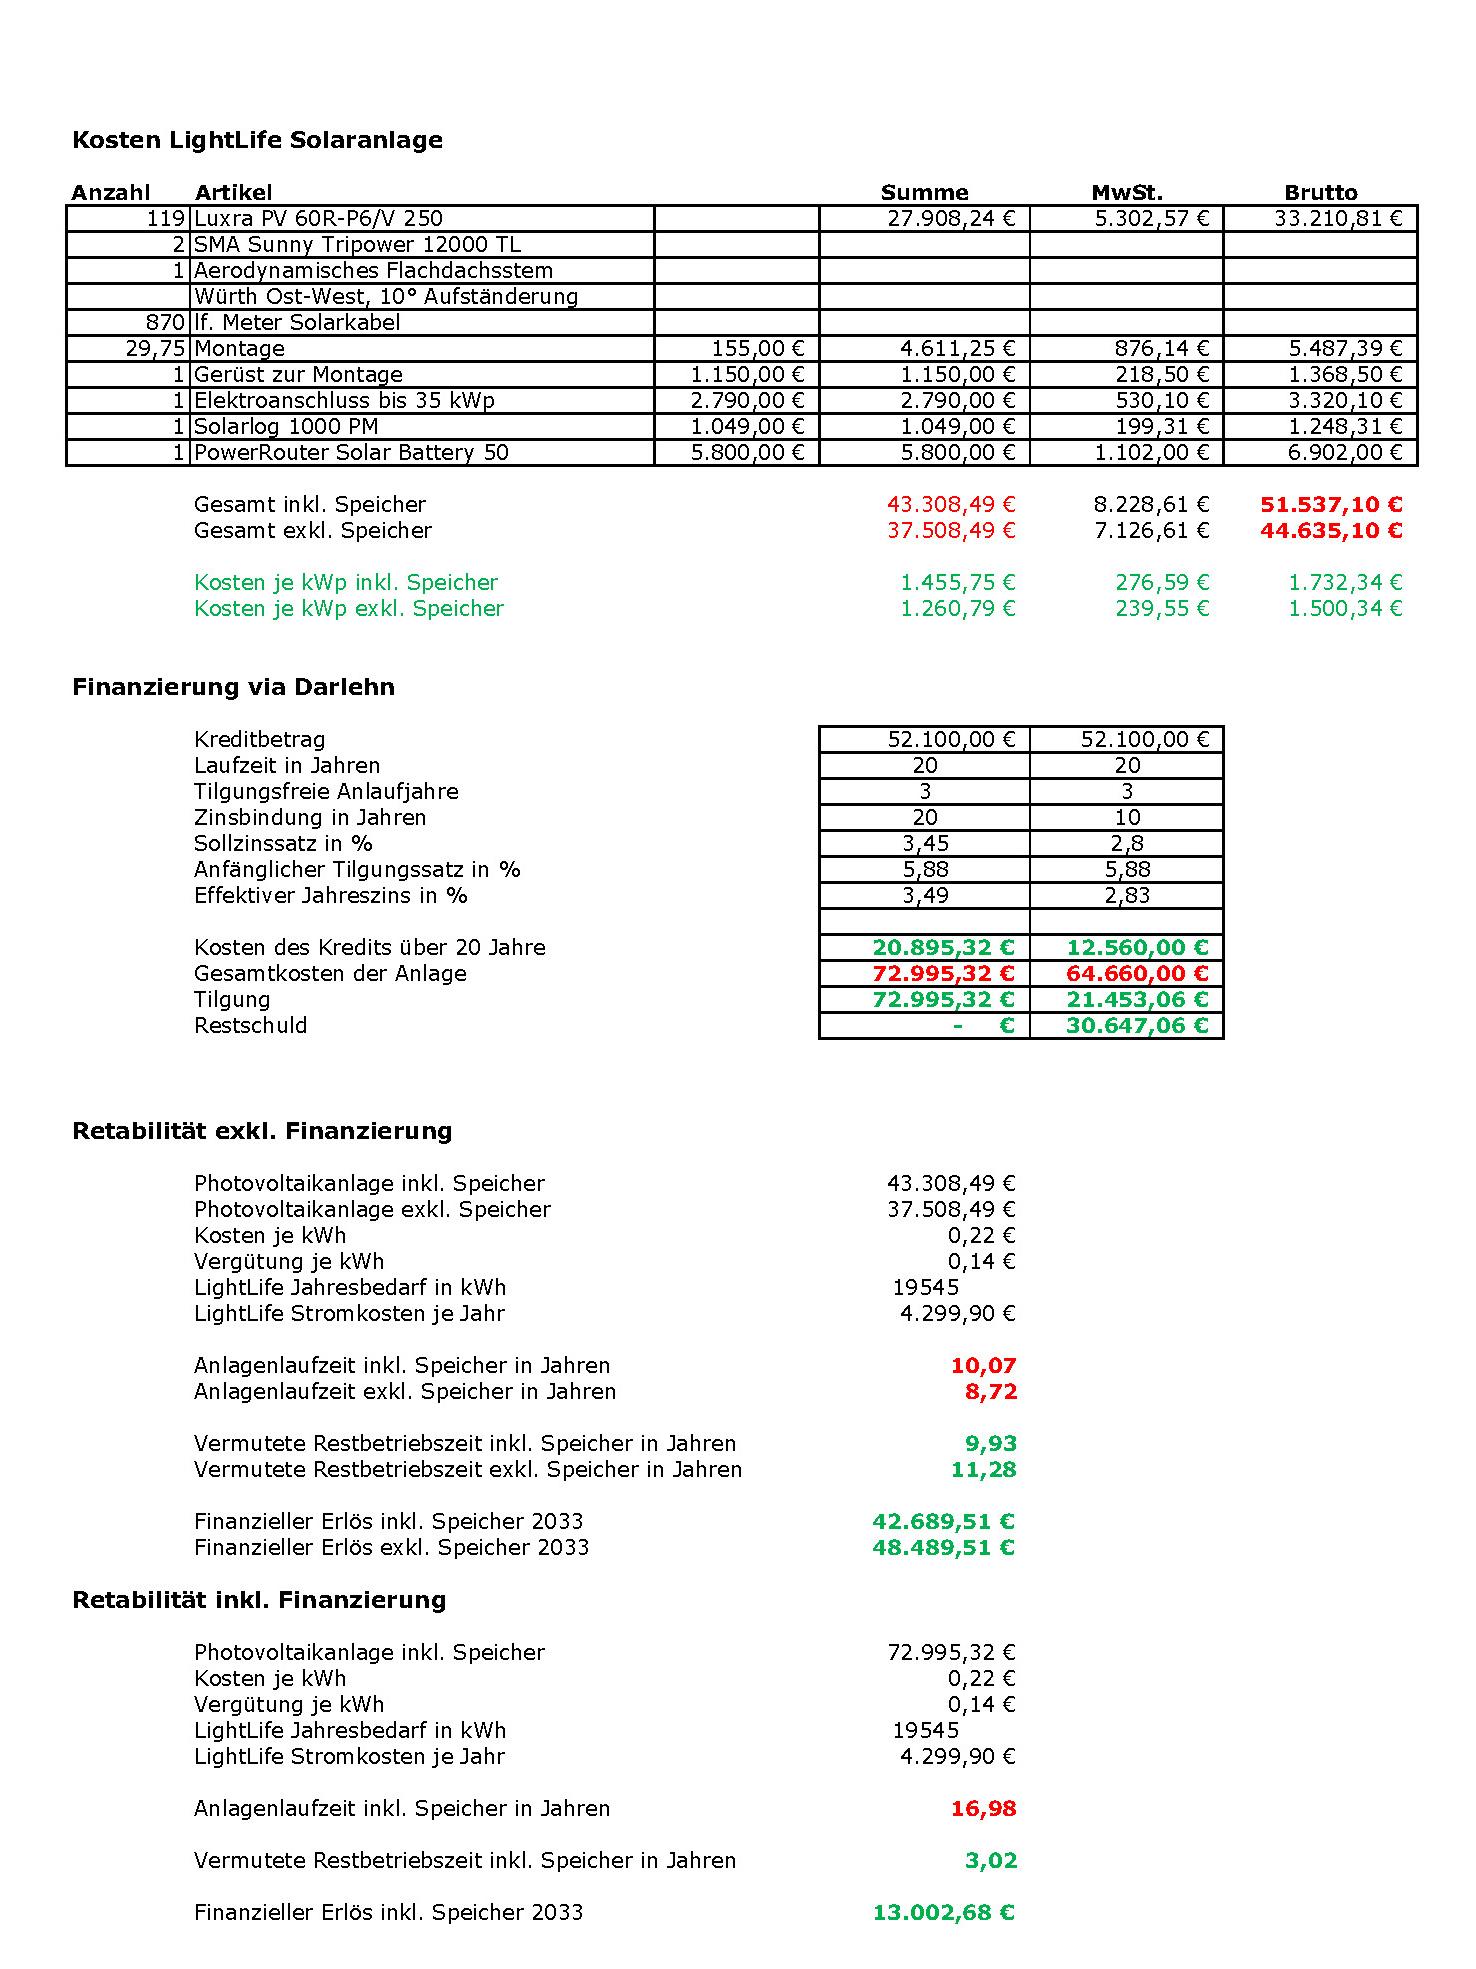 Photovoltaik LightLife Kosten